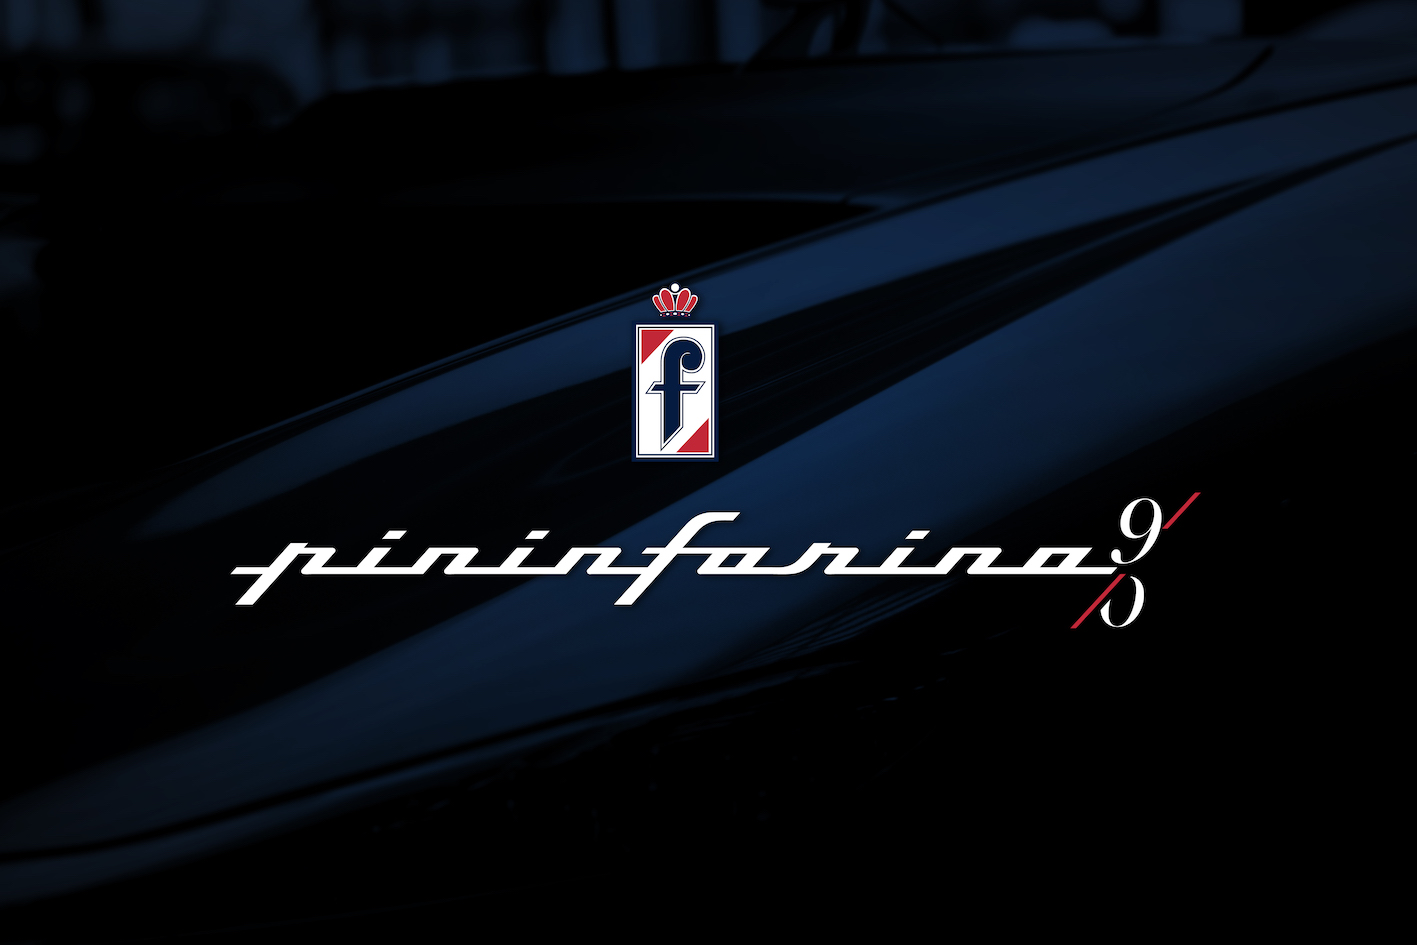 Nouveau logo : Pininfarina célèbrera ses 90 ans en 2020